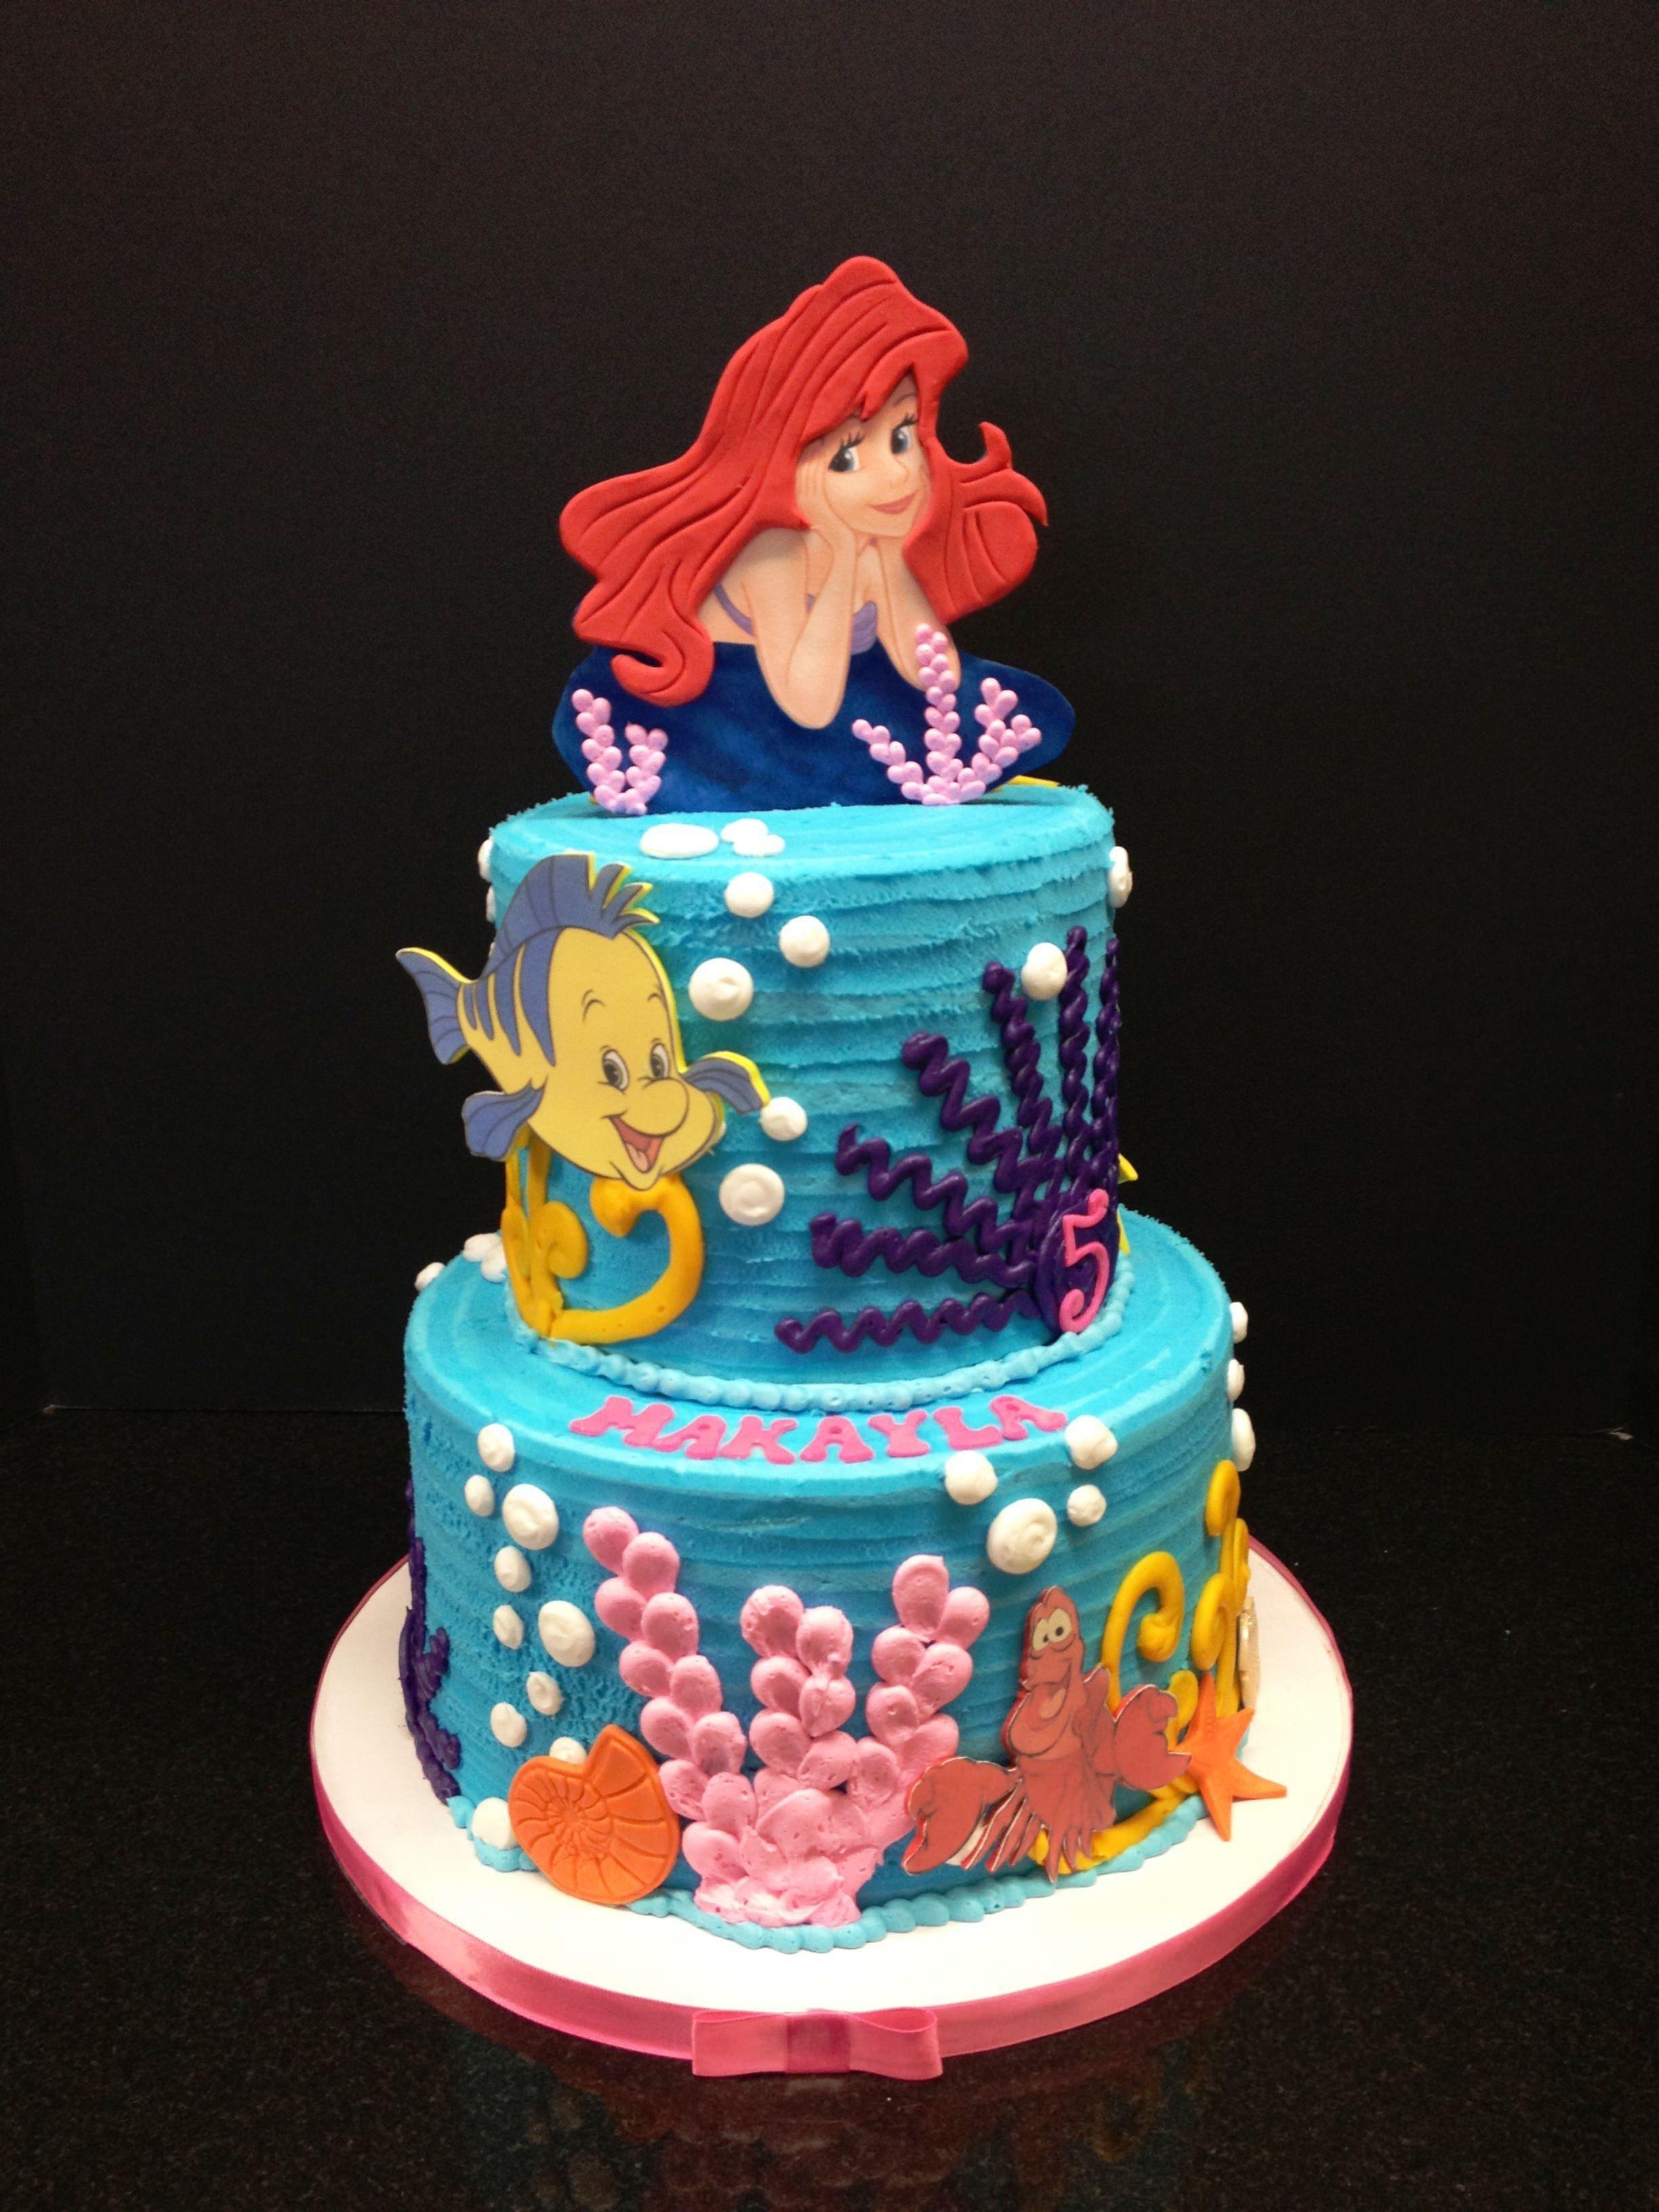 10 Great Little Mermaid Birthday Cake Ideas little mermaid birthday cake creative with homemade cake 2021